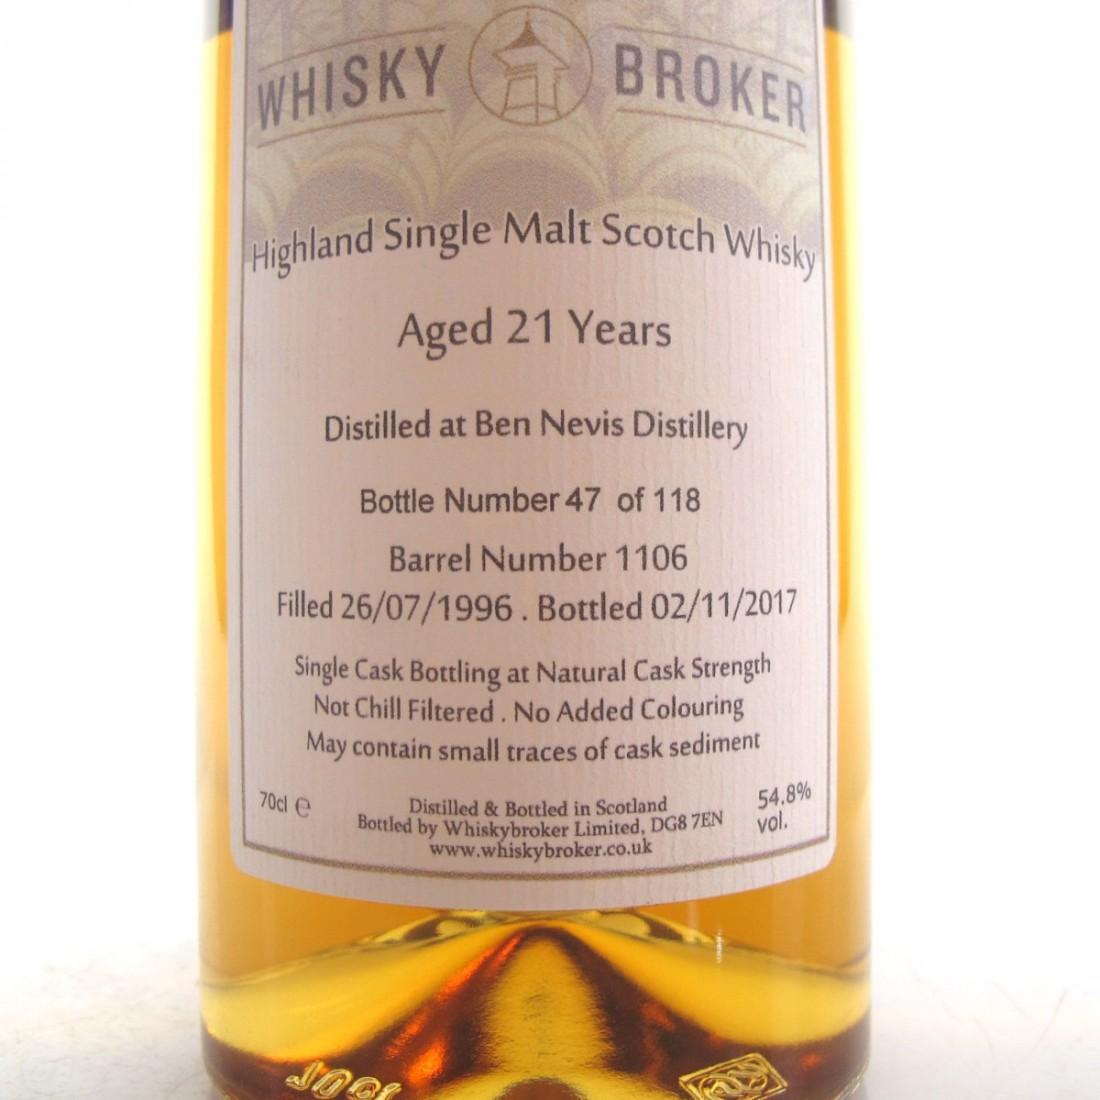 Ben Nevis 1996 Whisky Broker 21 Year Old